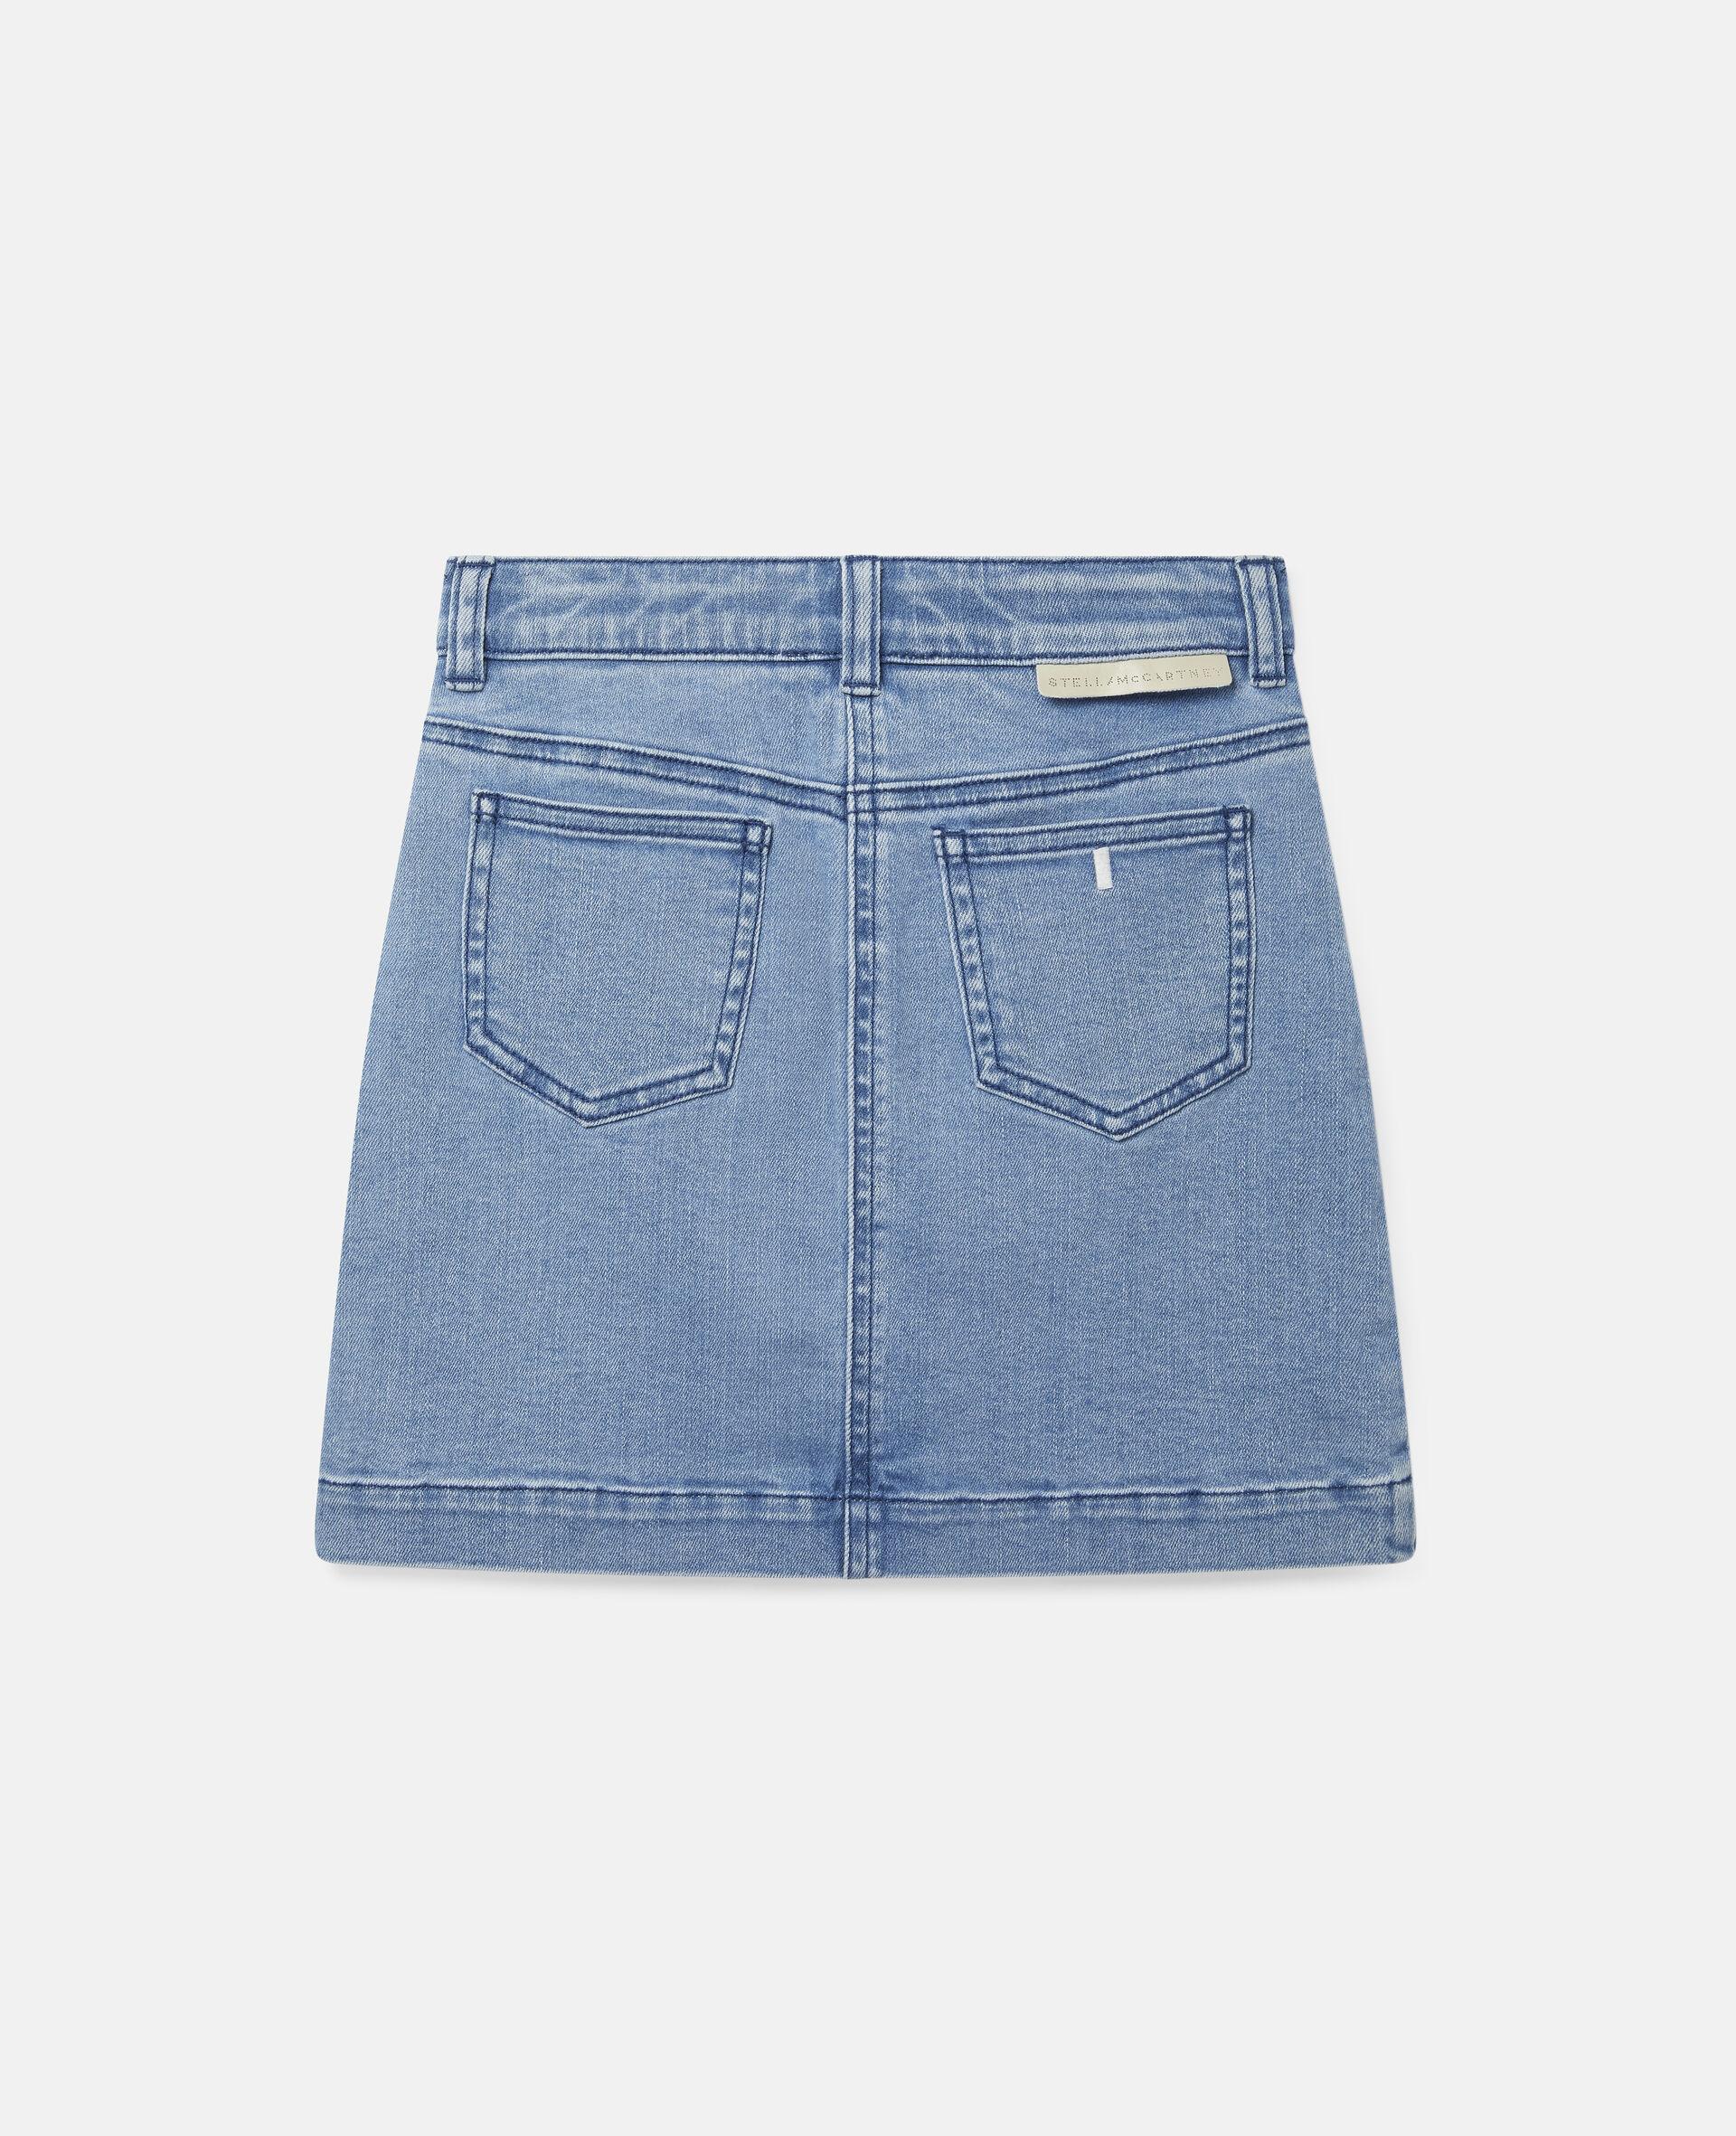 Embroidered Flowers Denim Skirt -Blue-large image number 3